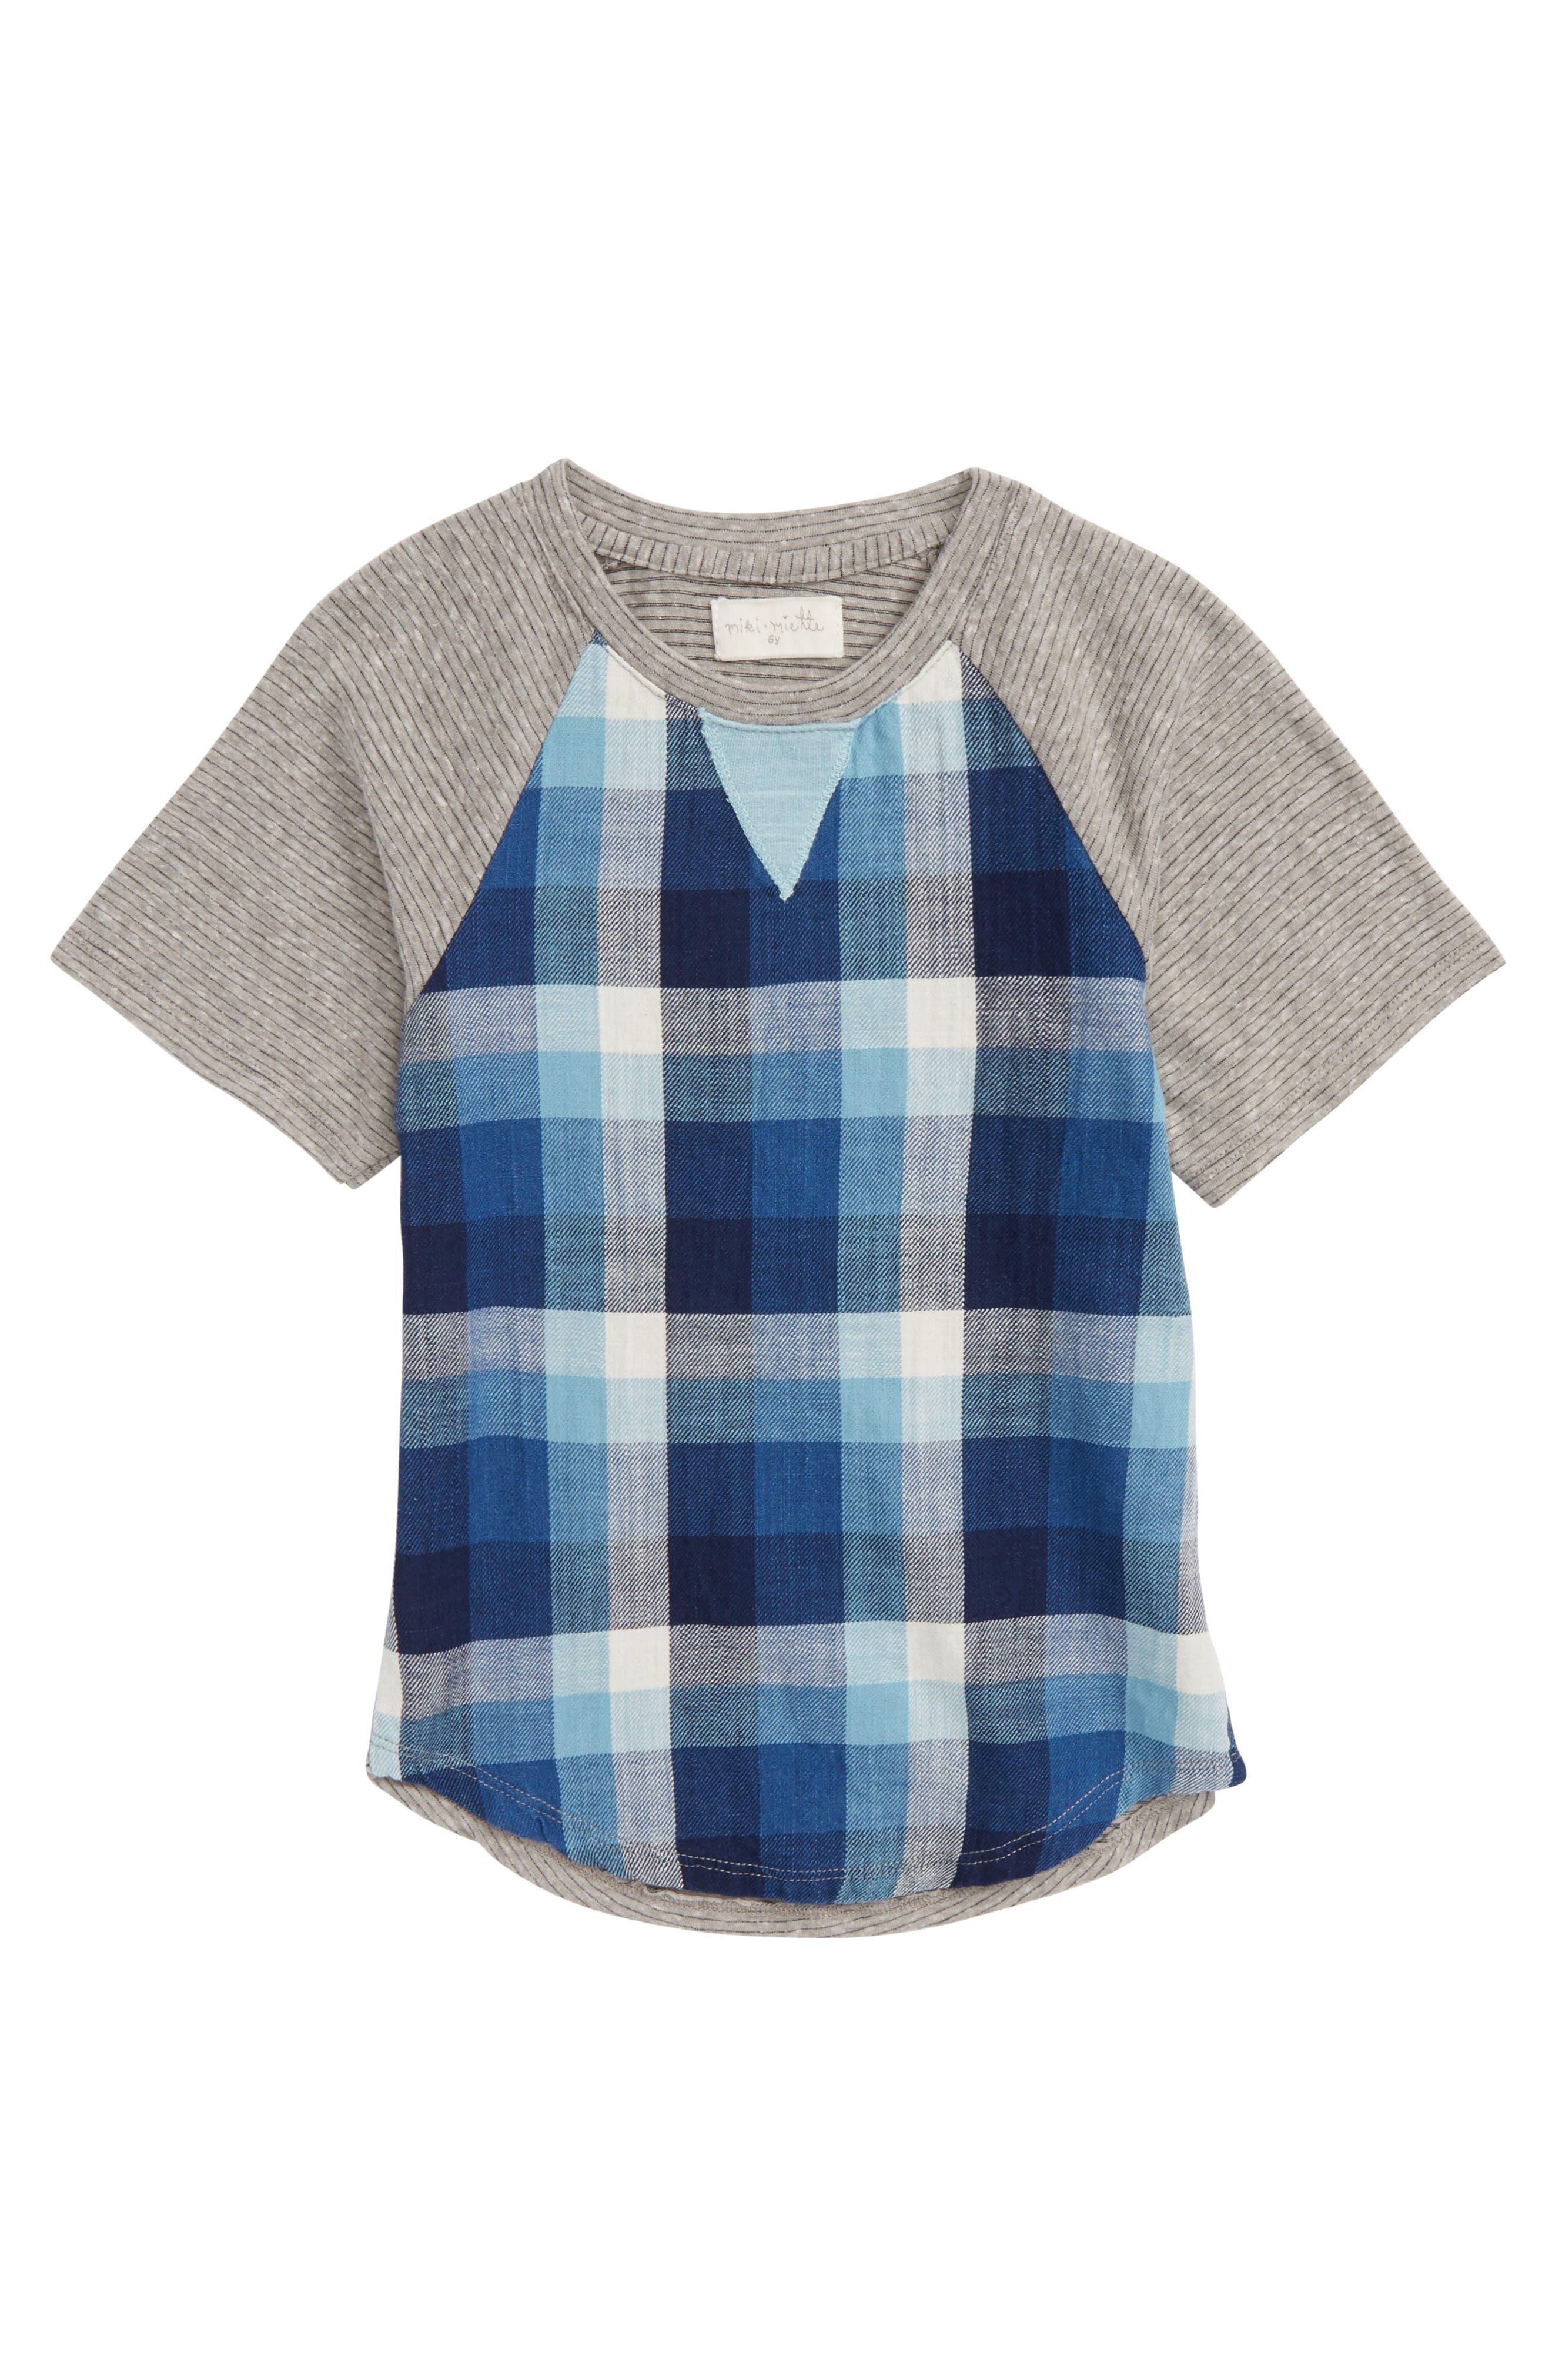 Miki Miette Caz Plaid T-Shirt (Toddler Boys, Little Boys & Big Boys)